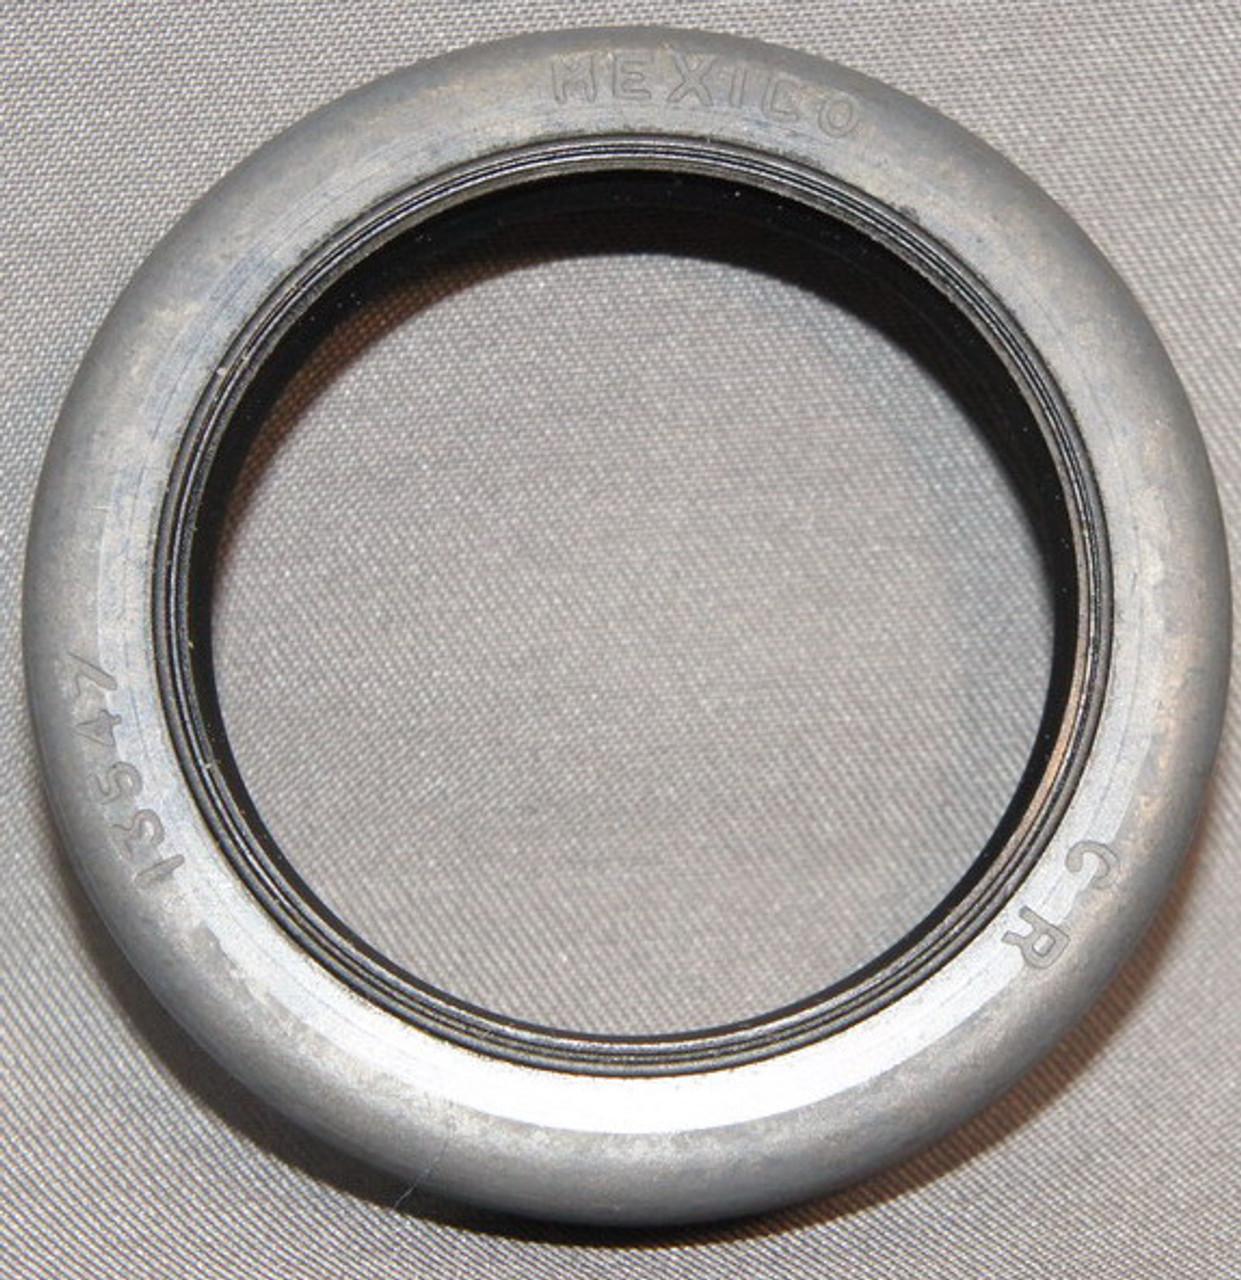 TorRey M-12FS & M-22 Series Seal (Back) - 05-00189